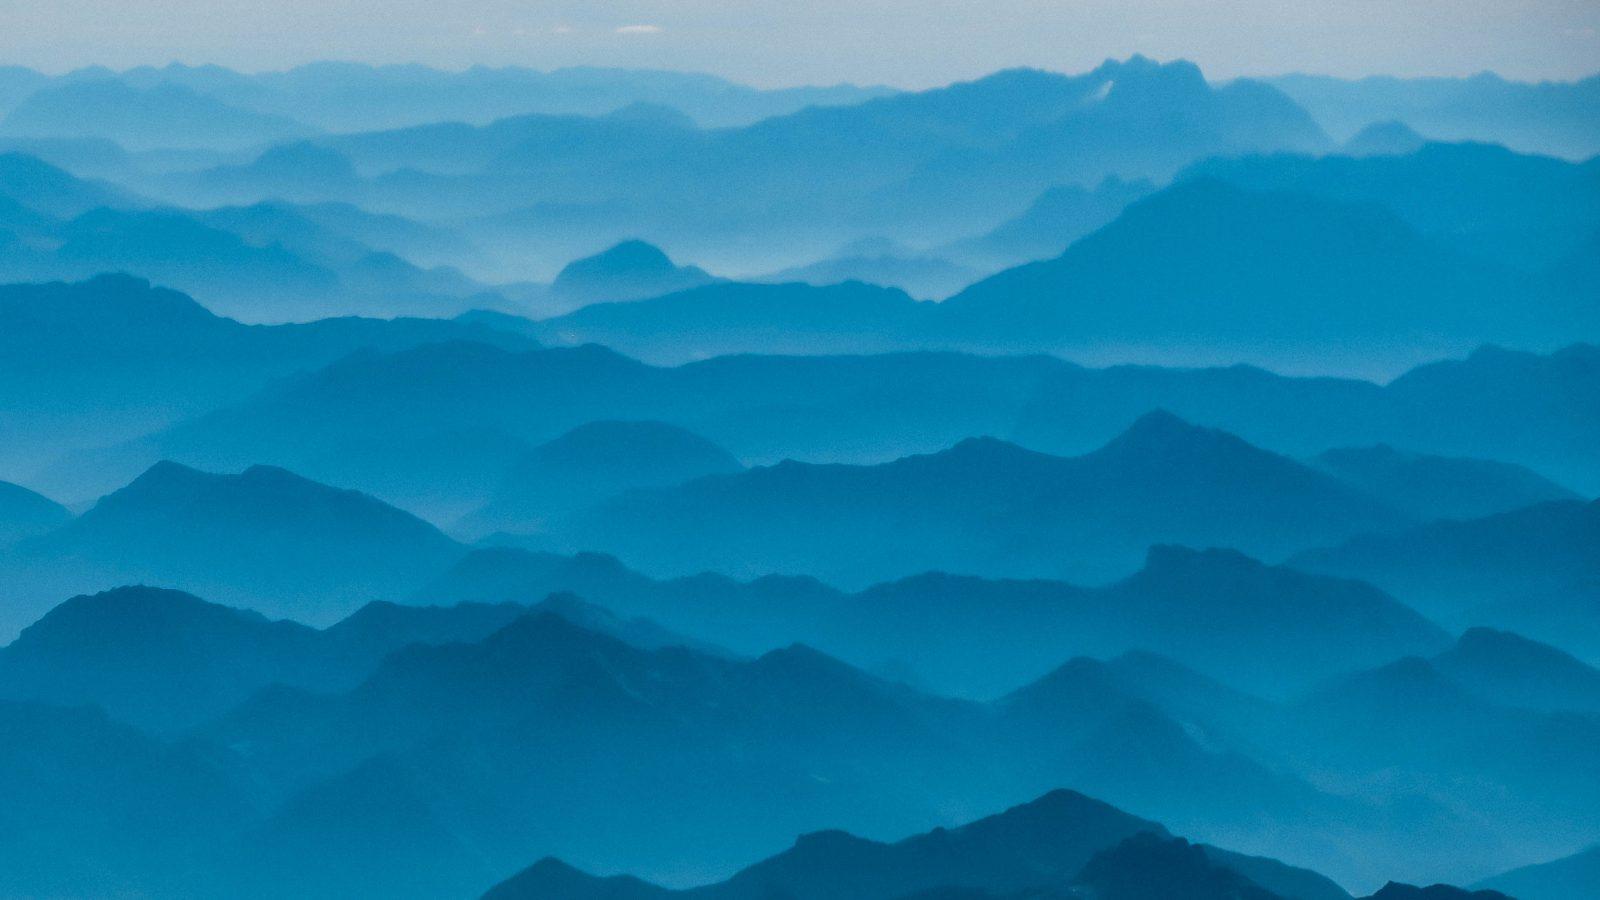 bird's eye view of mountain